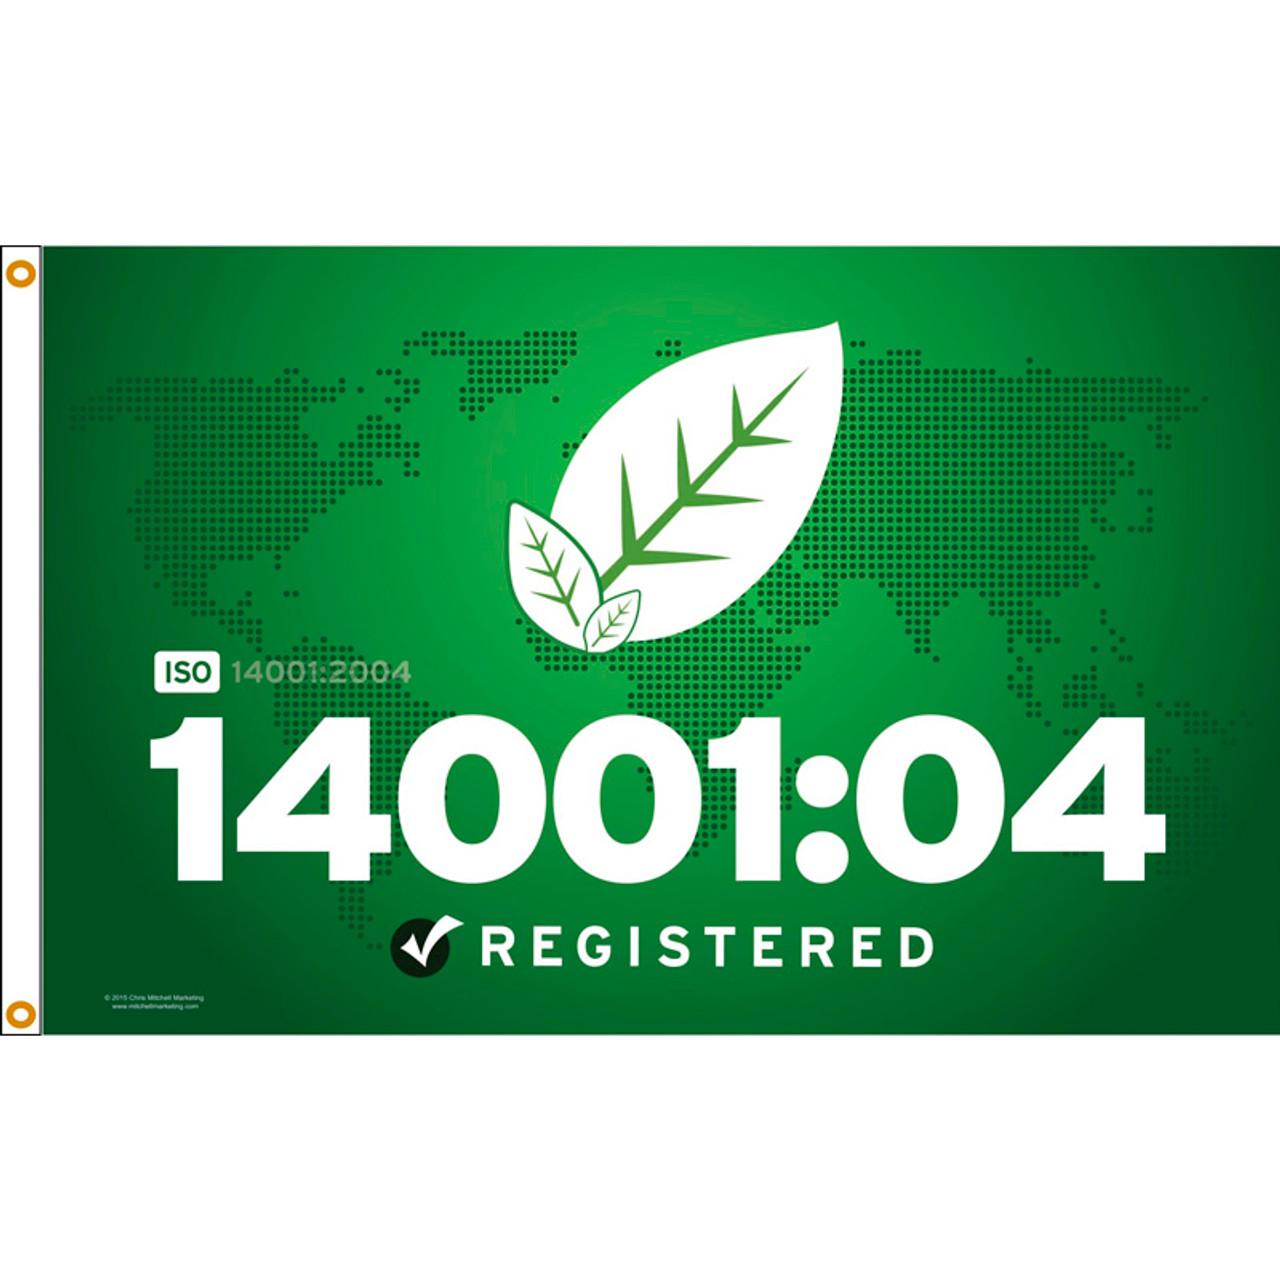 ISO 14001/04 Flag